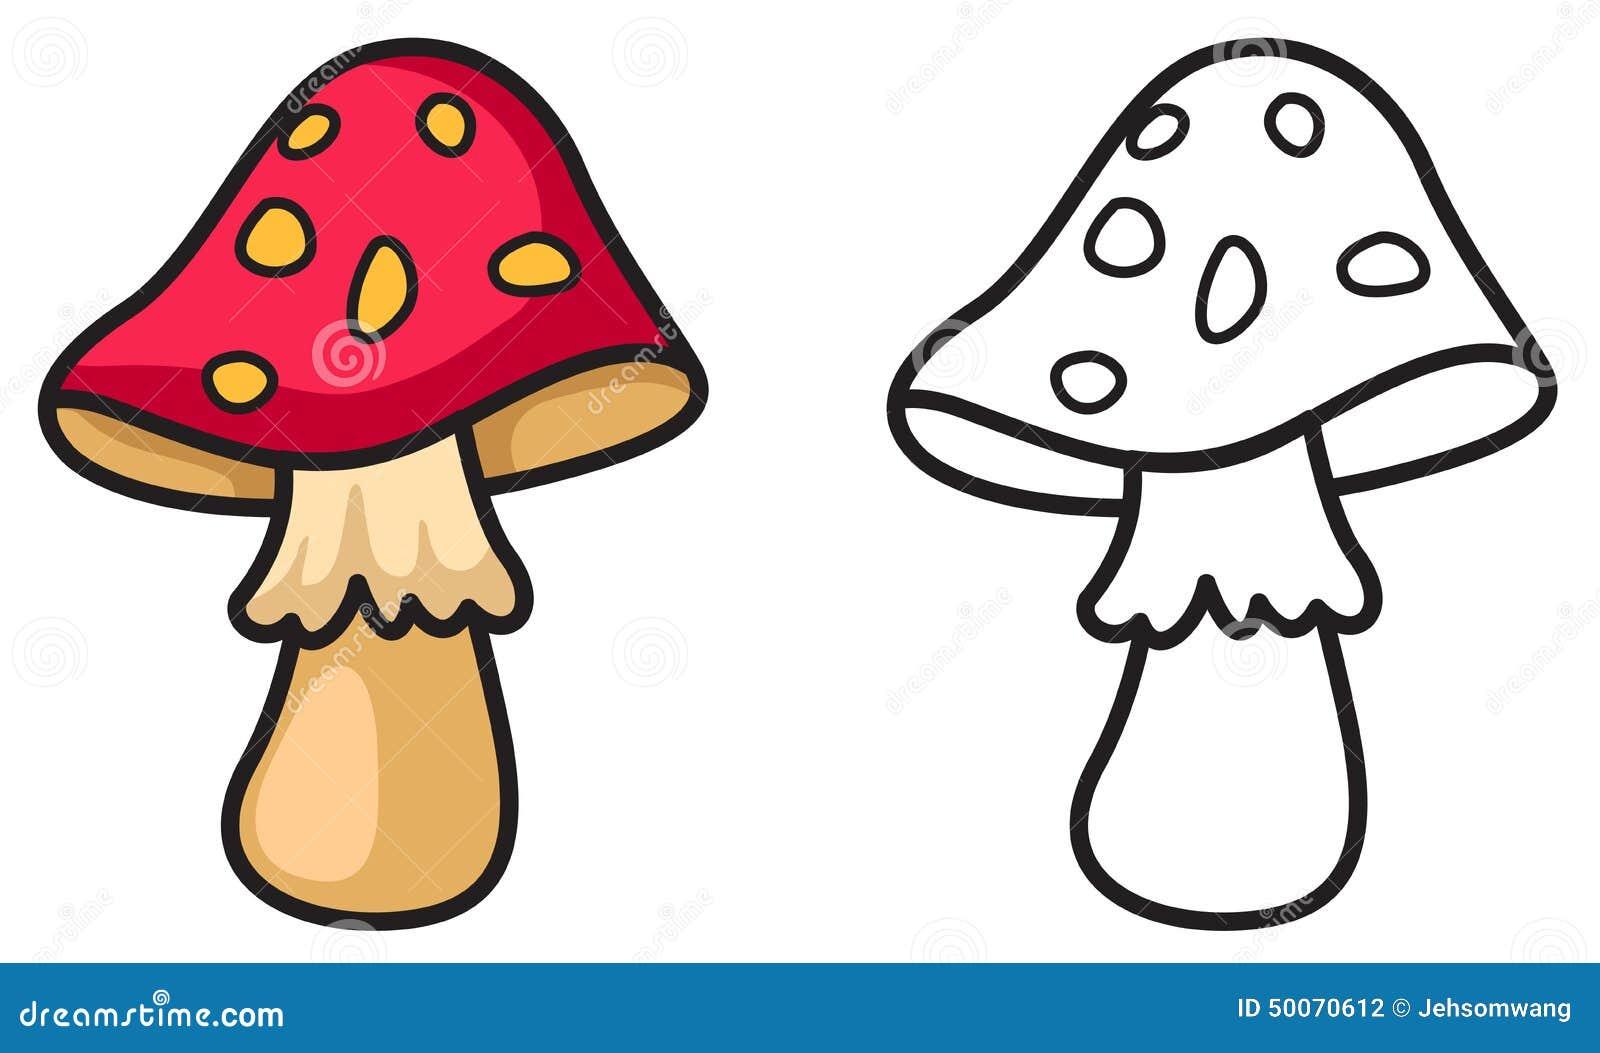 картинка черно-белая гриб